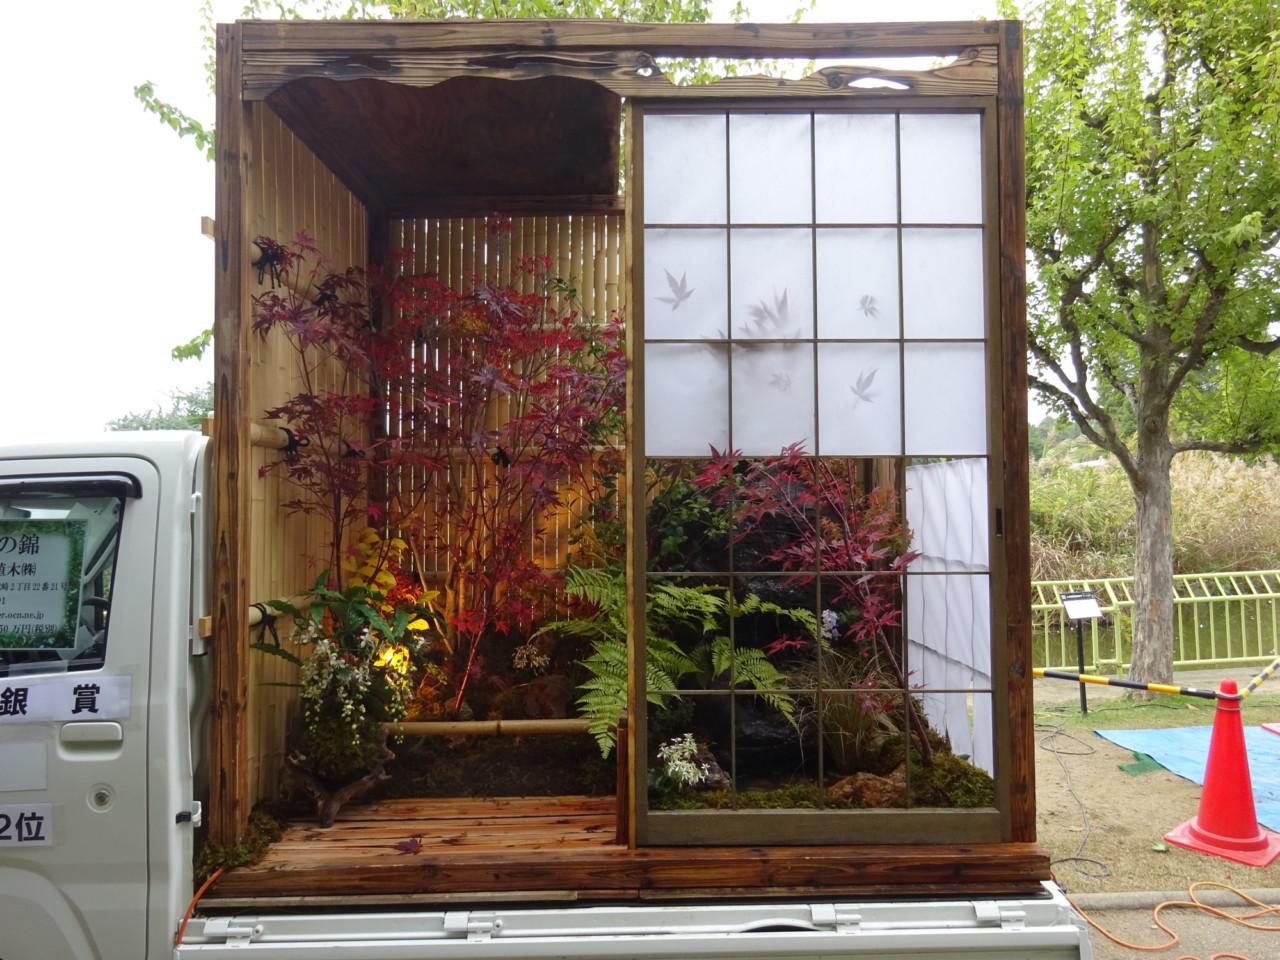 truck-garden-3-640x480@2x